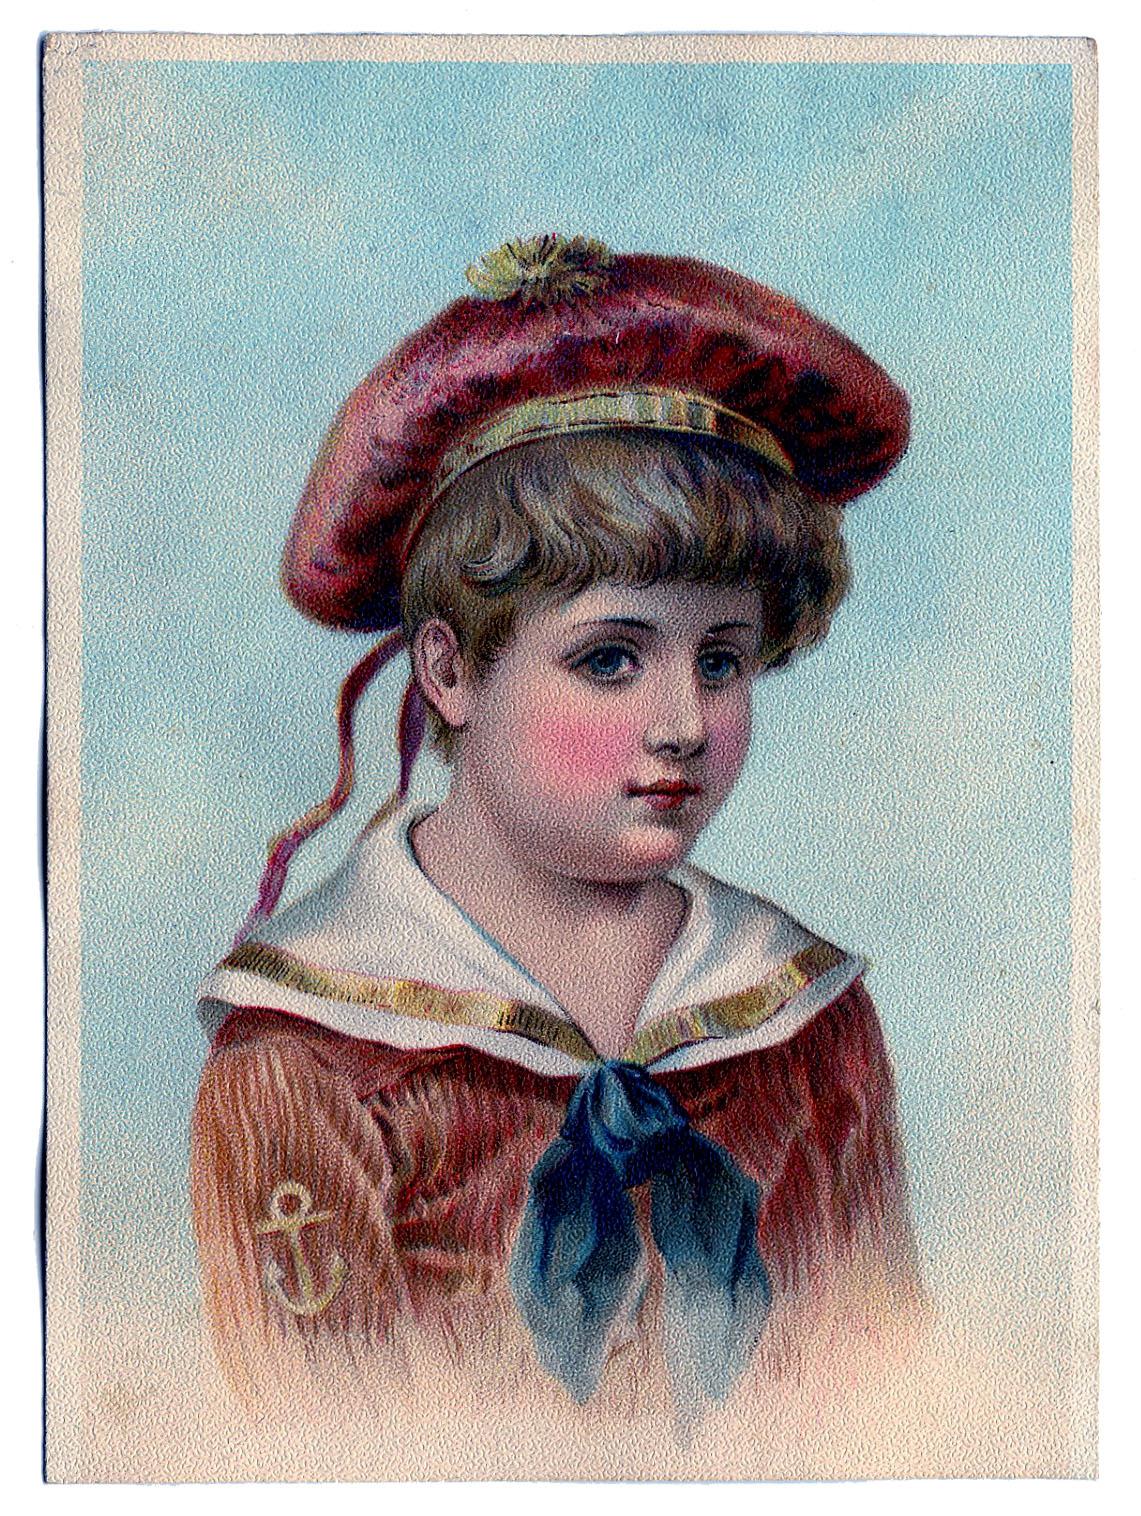 Vintage Clip Art Darling Victorian Sailor Boy The